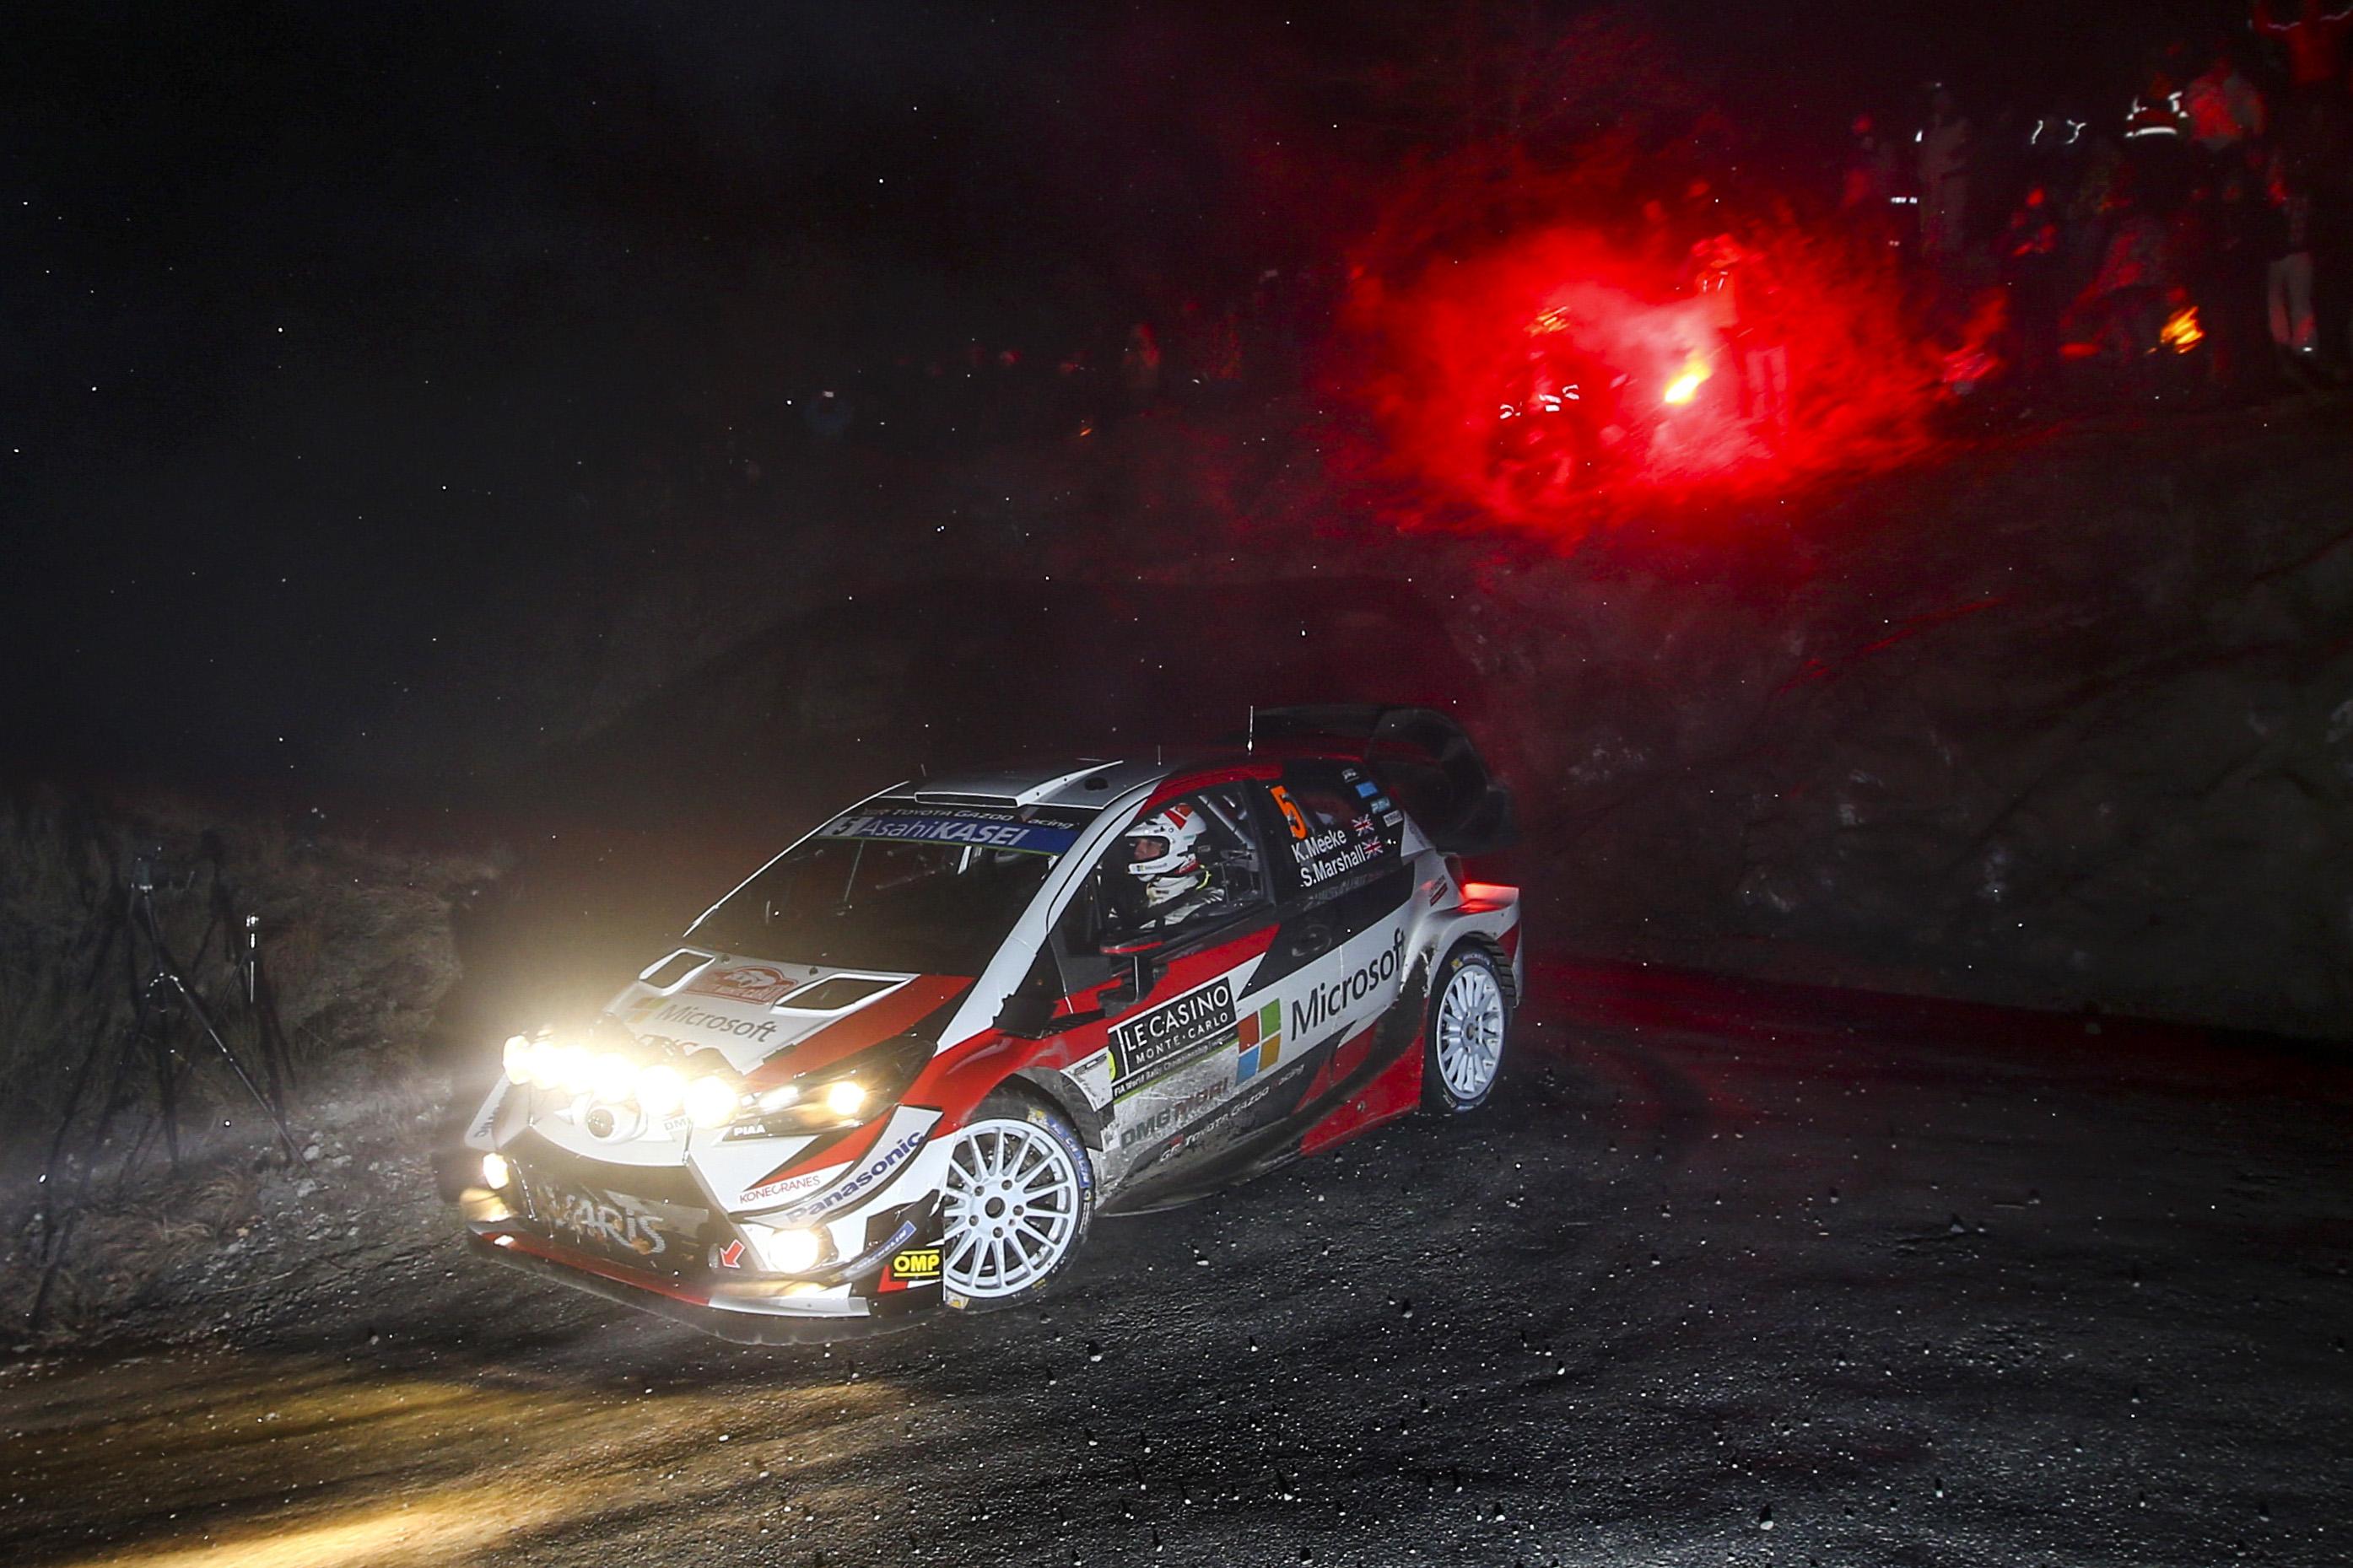 FIA World Rally Championship 2019 / Round 01 / Monte Carlo Rally / January 24-27, 2019 // Worldwide Copyright: Toyota Gazoo Racing WRC